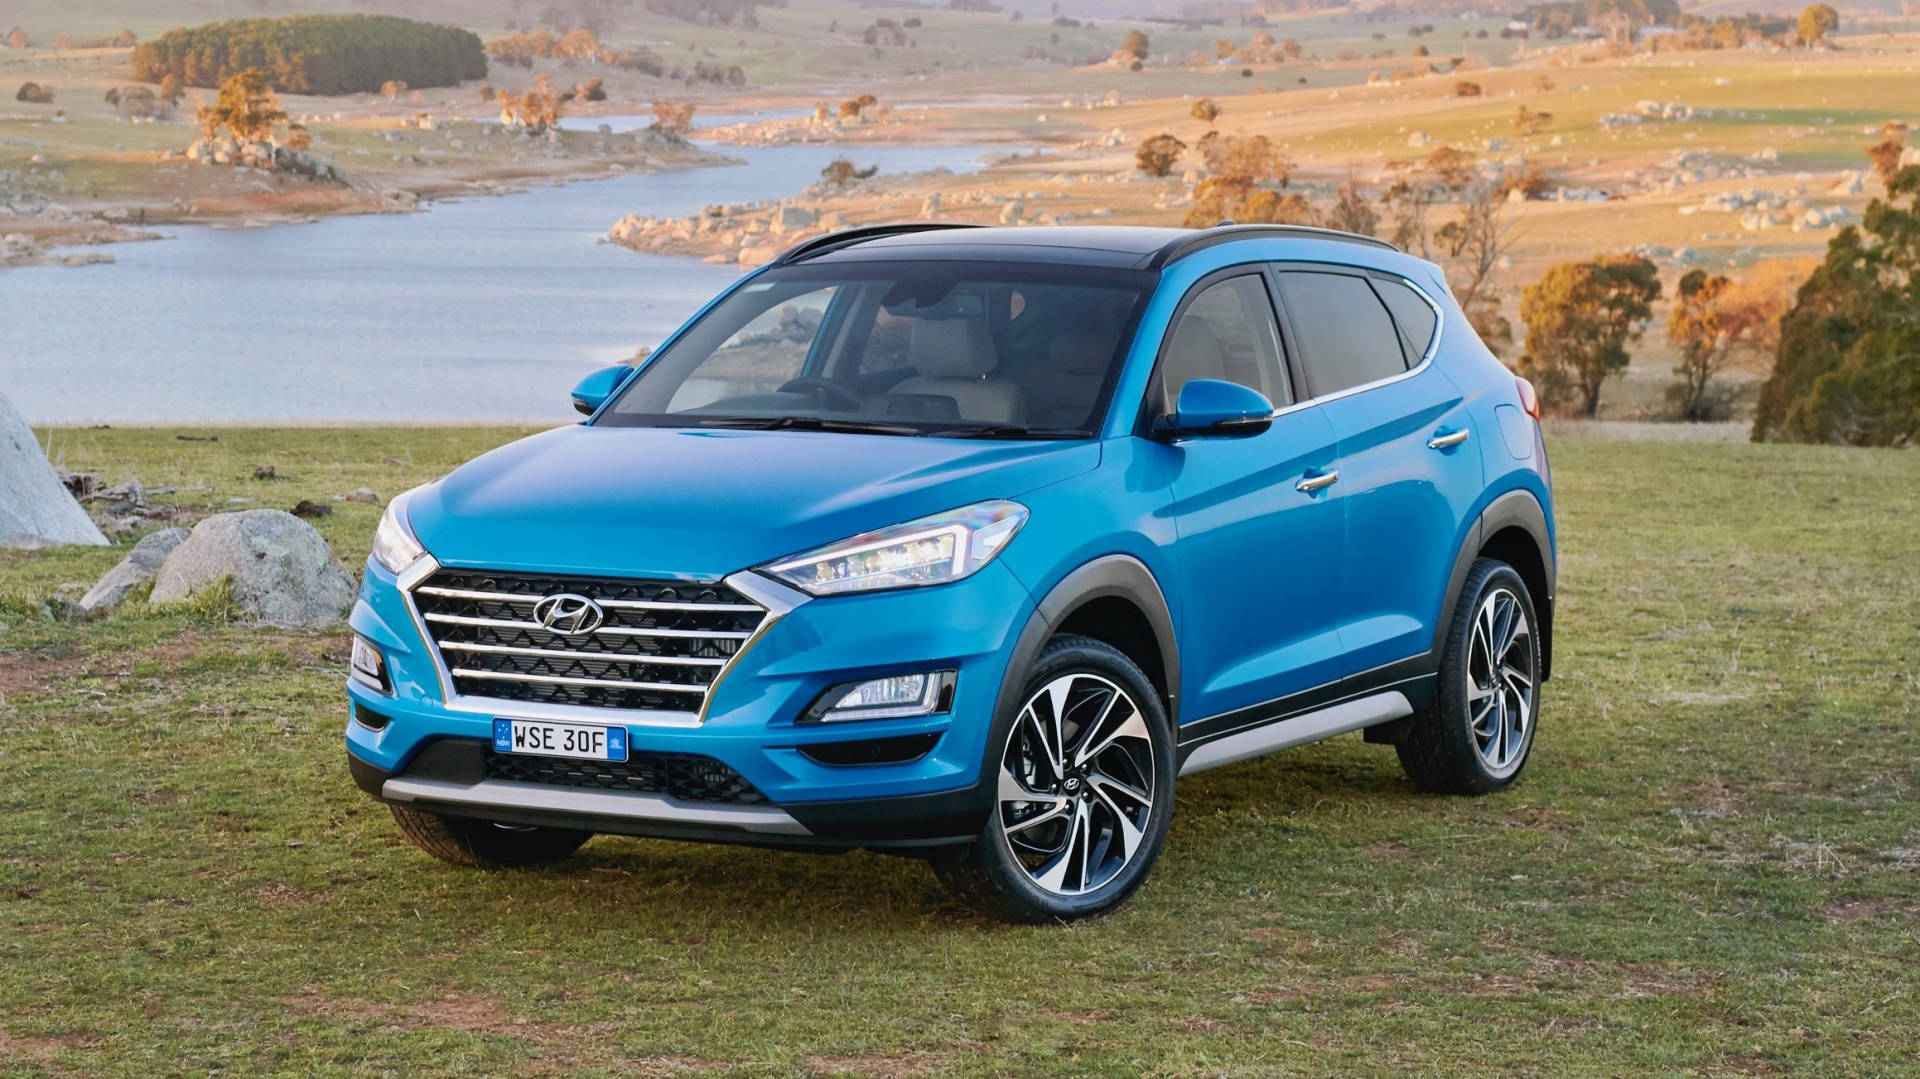 2019 Hyundai Tucson Highlander Aqua Blue front 3/4